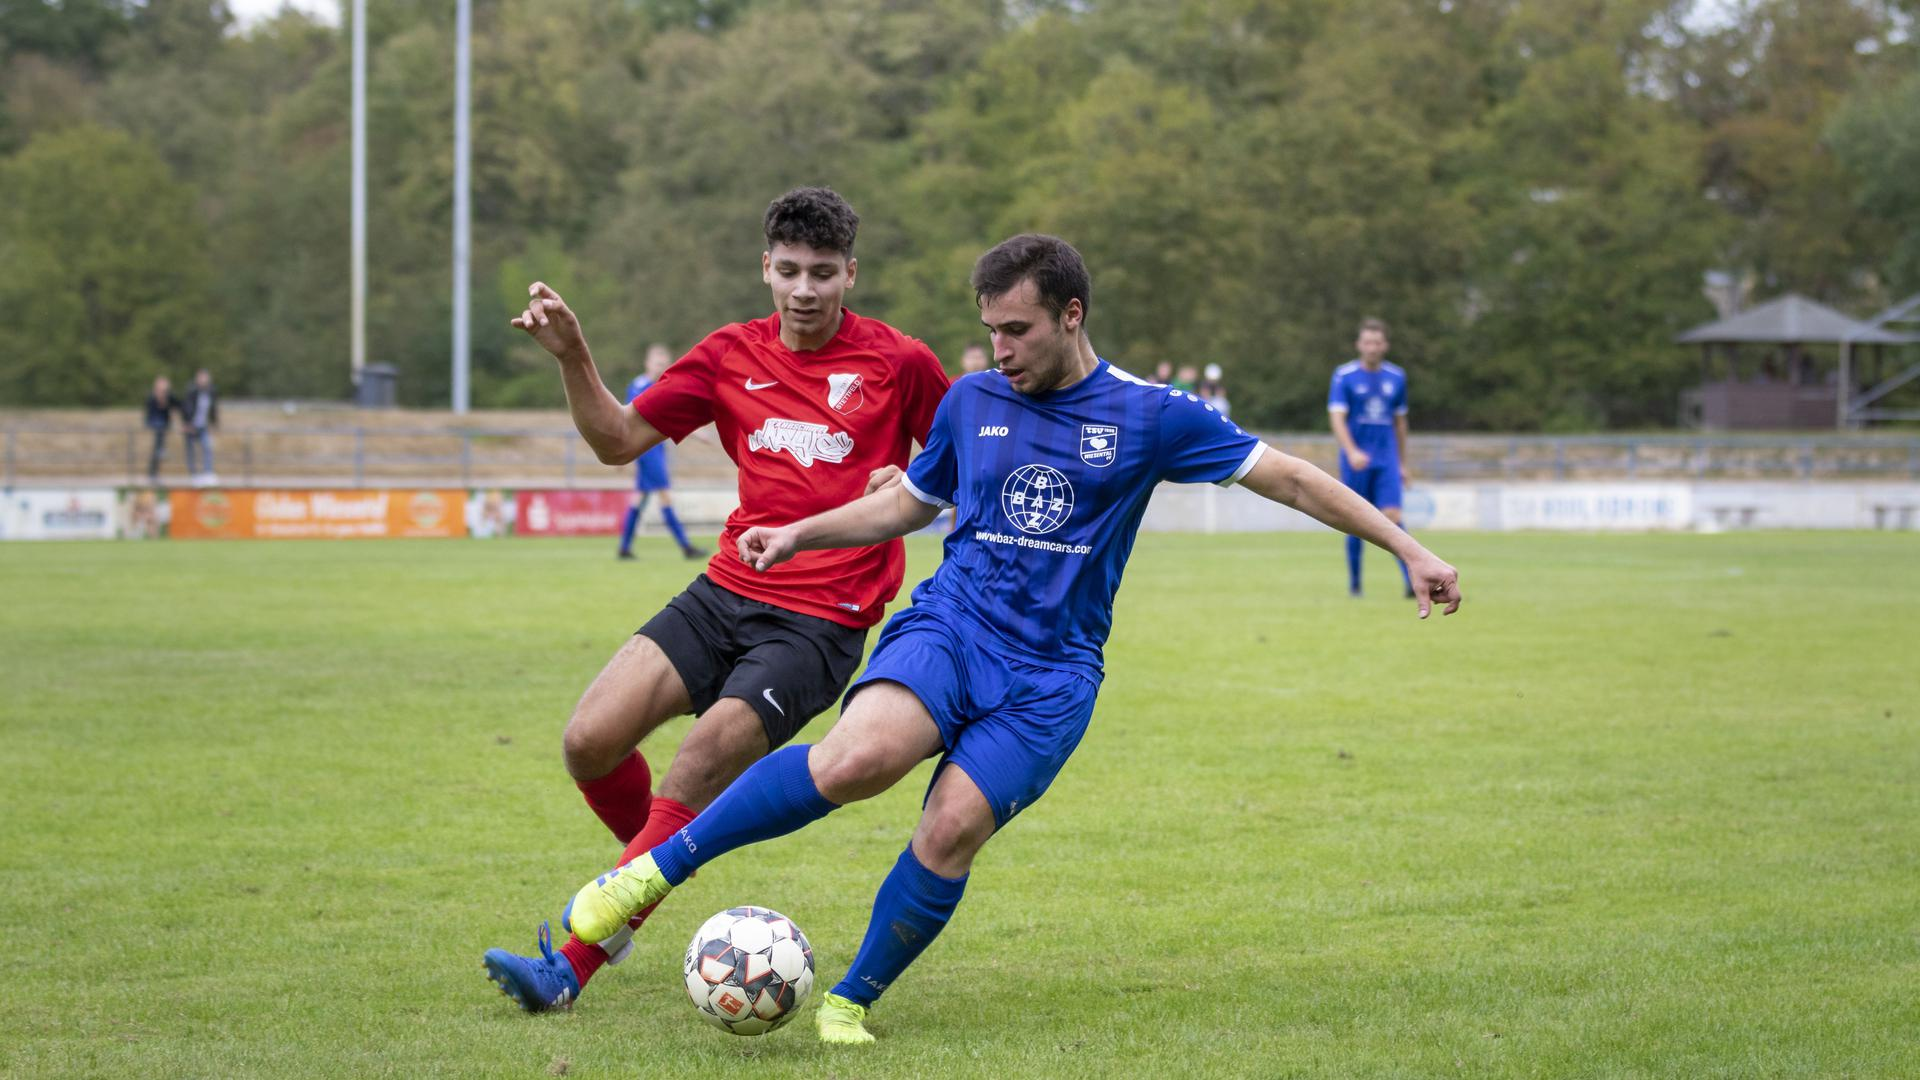 TSV 1898 Wiesental gegen TSV Stettfeld; im Bild: Noah Matic - Stettfeld und Melih Sahin - Wiesental.